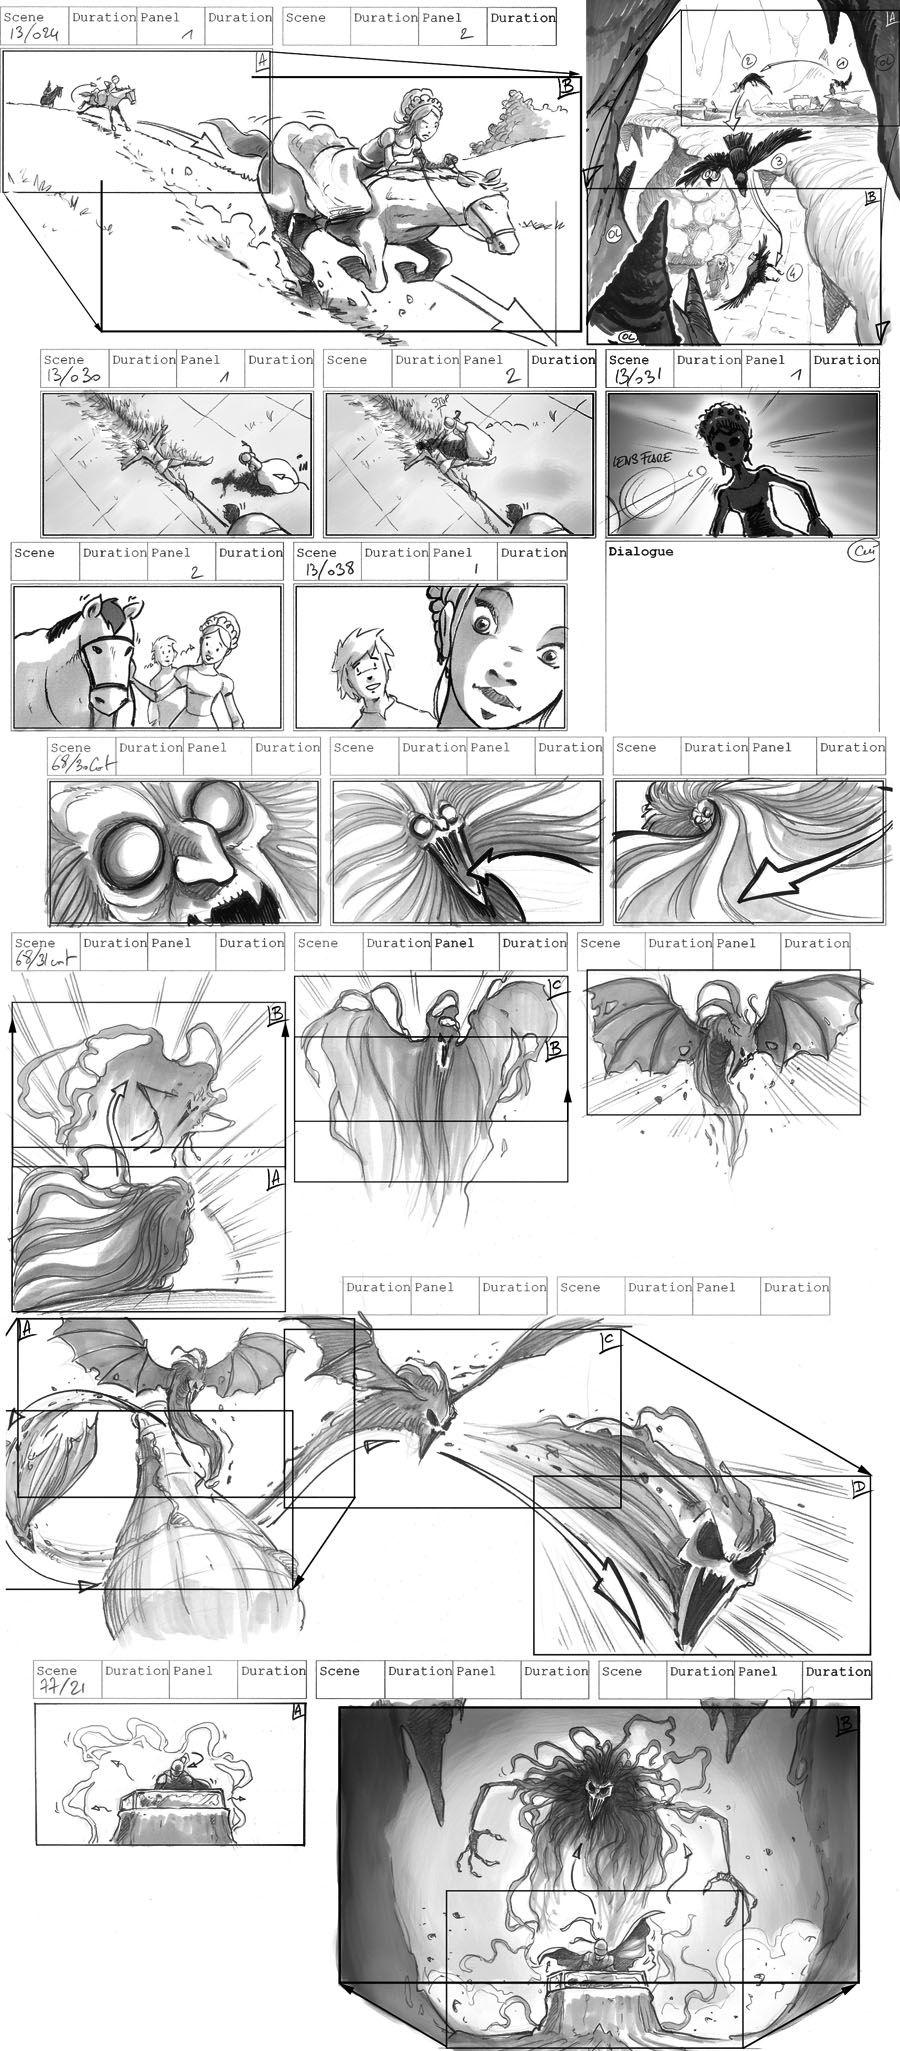 Galeries  Storyboard Live  Pascal Thiebaux HttpThiebaux